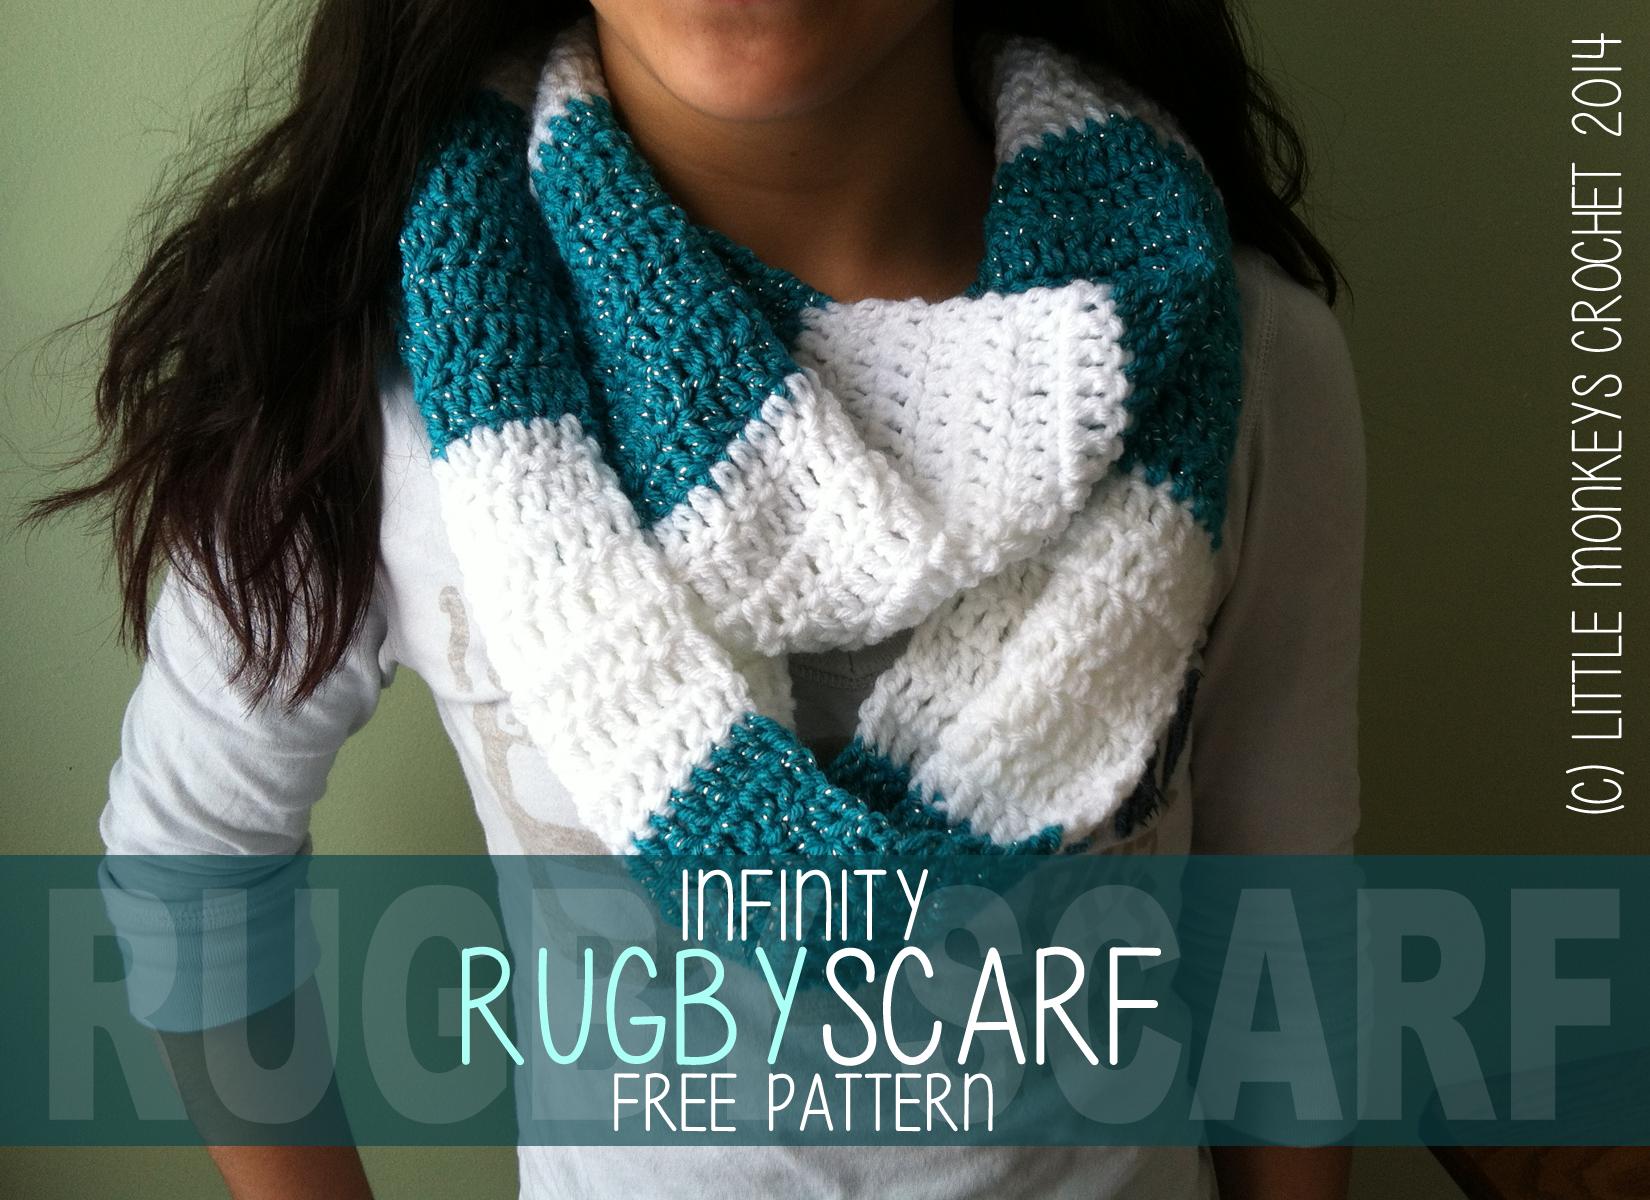 Crochet Infinity Rugby Scarf Pattern (Free Crochet Infinity Striped ...